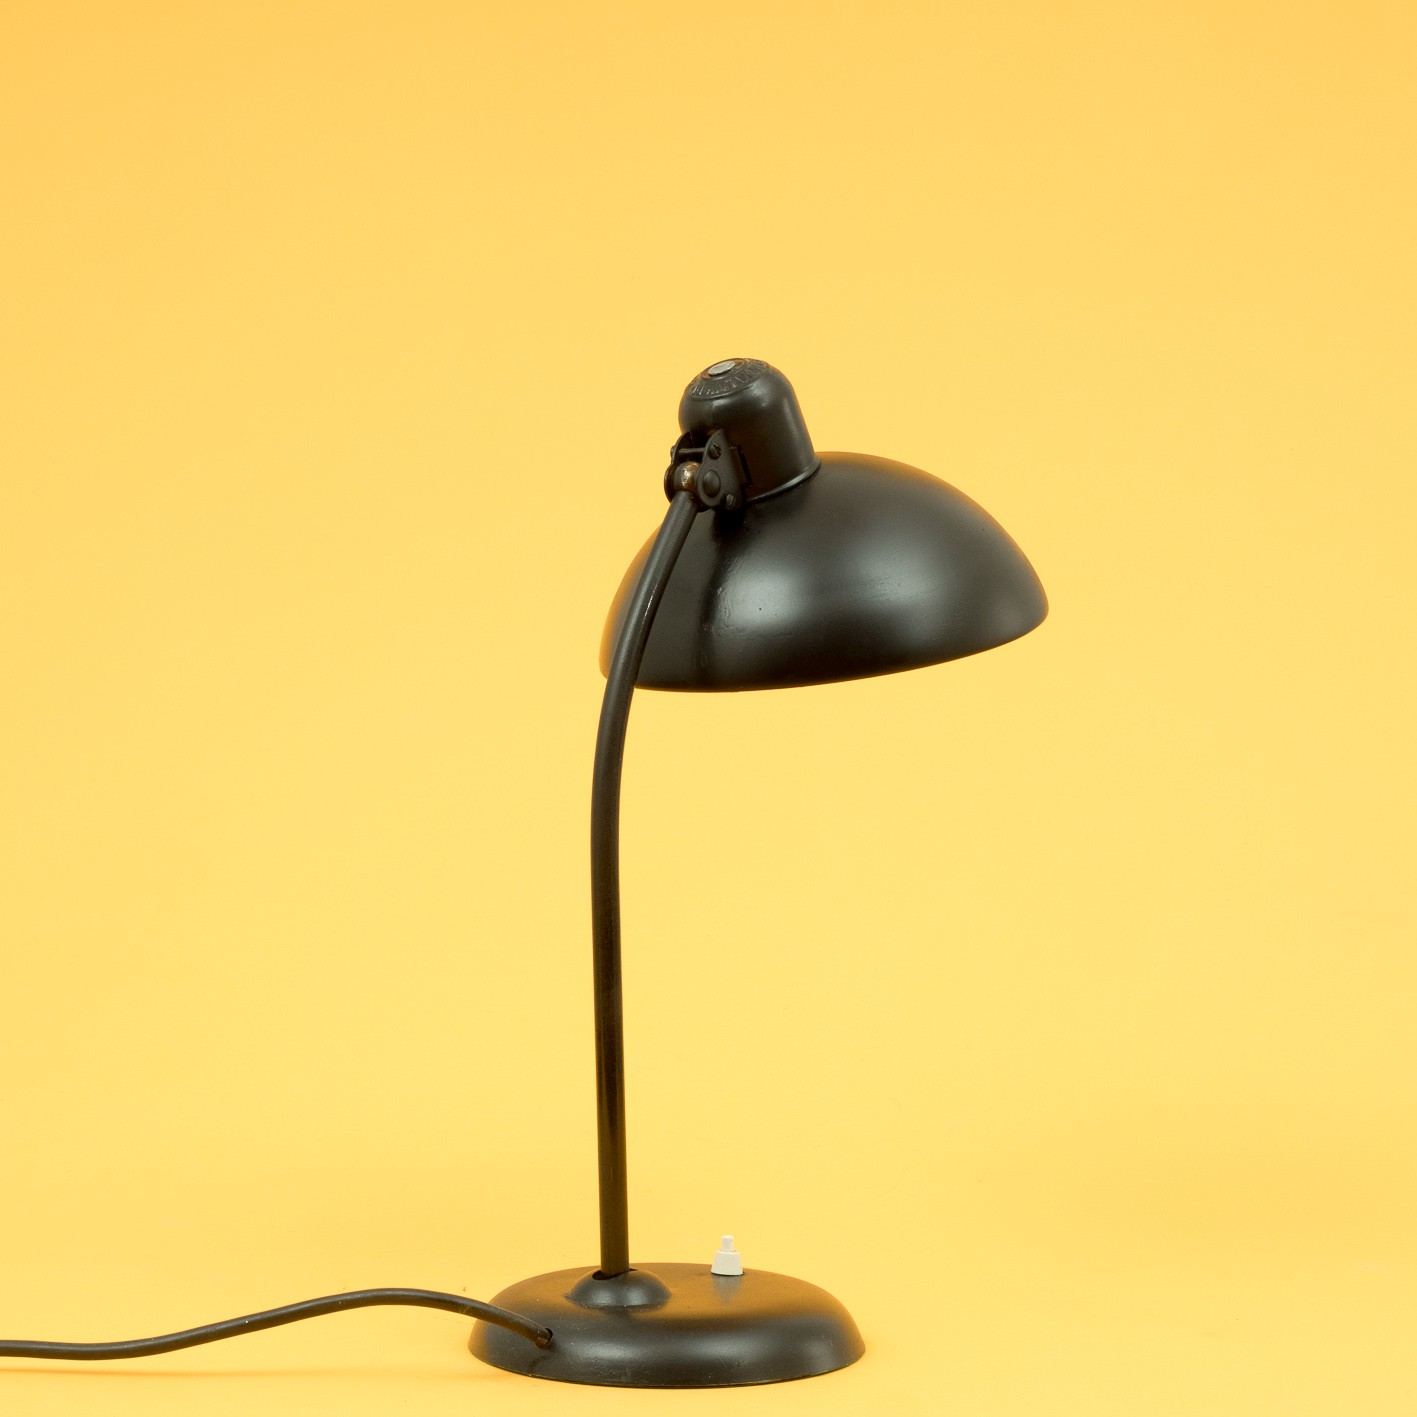 kaiser idell 6556 table lamp in metal 1960s design. Black Bedroom Furniture Sets. Home Design Ideas